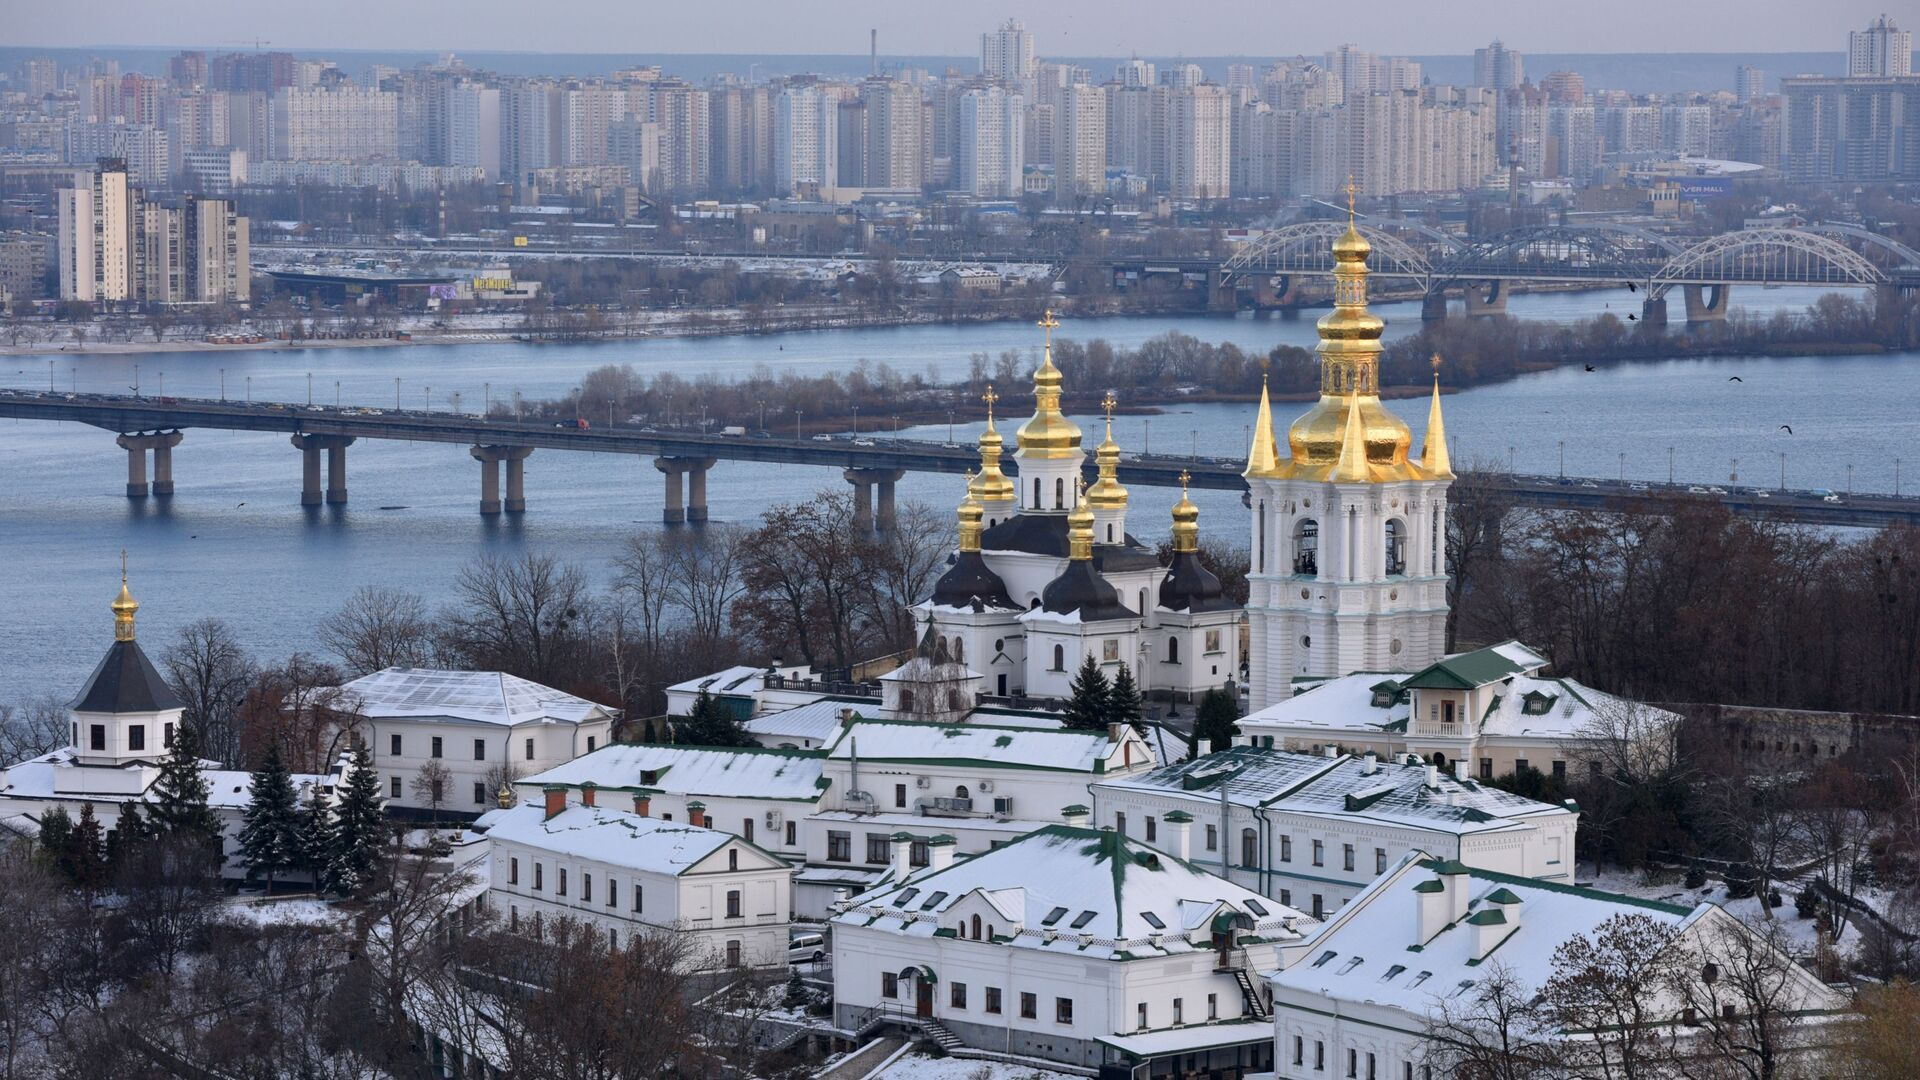 Тезис об угрозе со стороны России абсурден, заявил Мезенцев